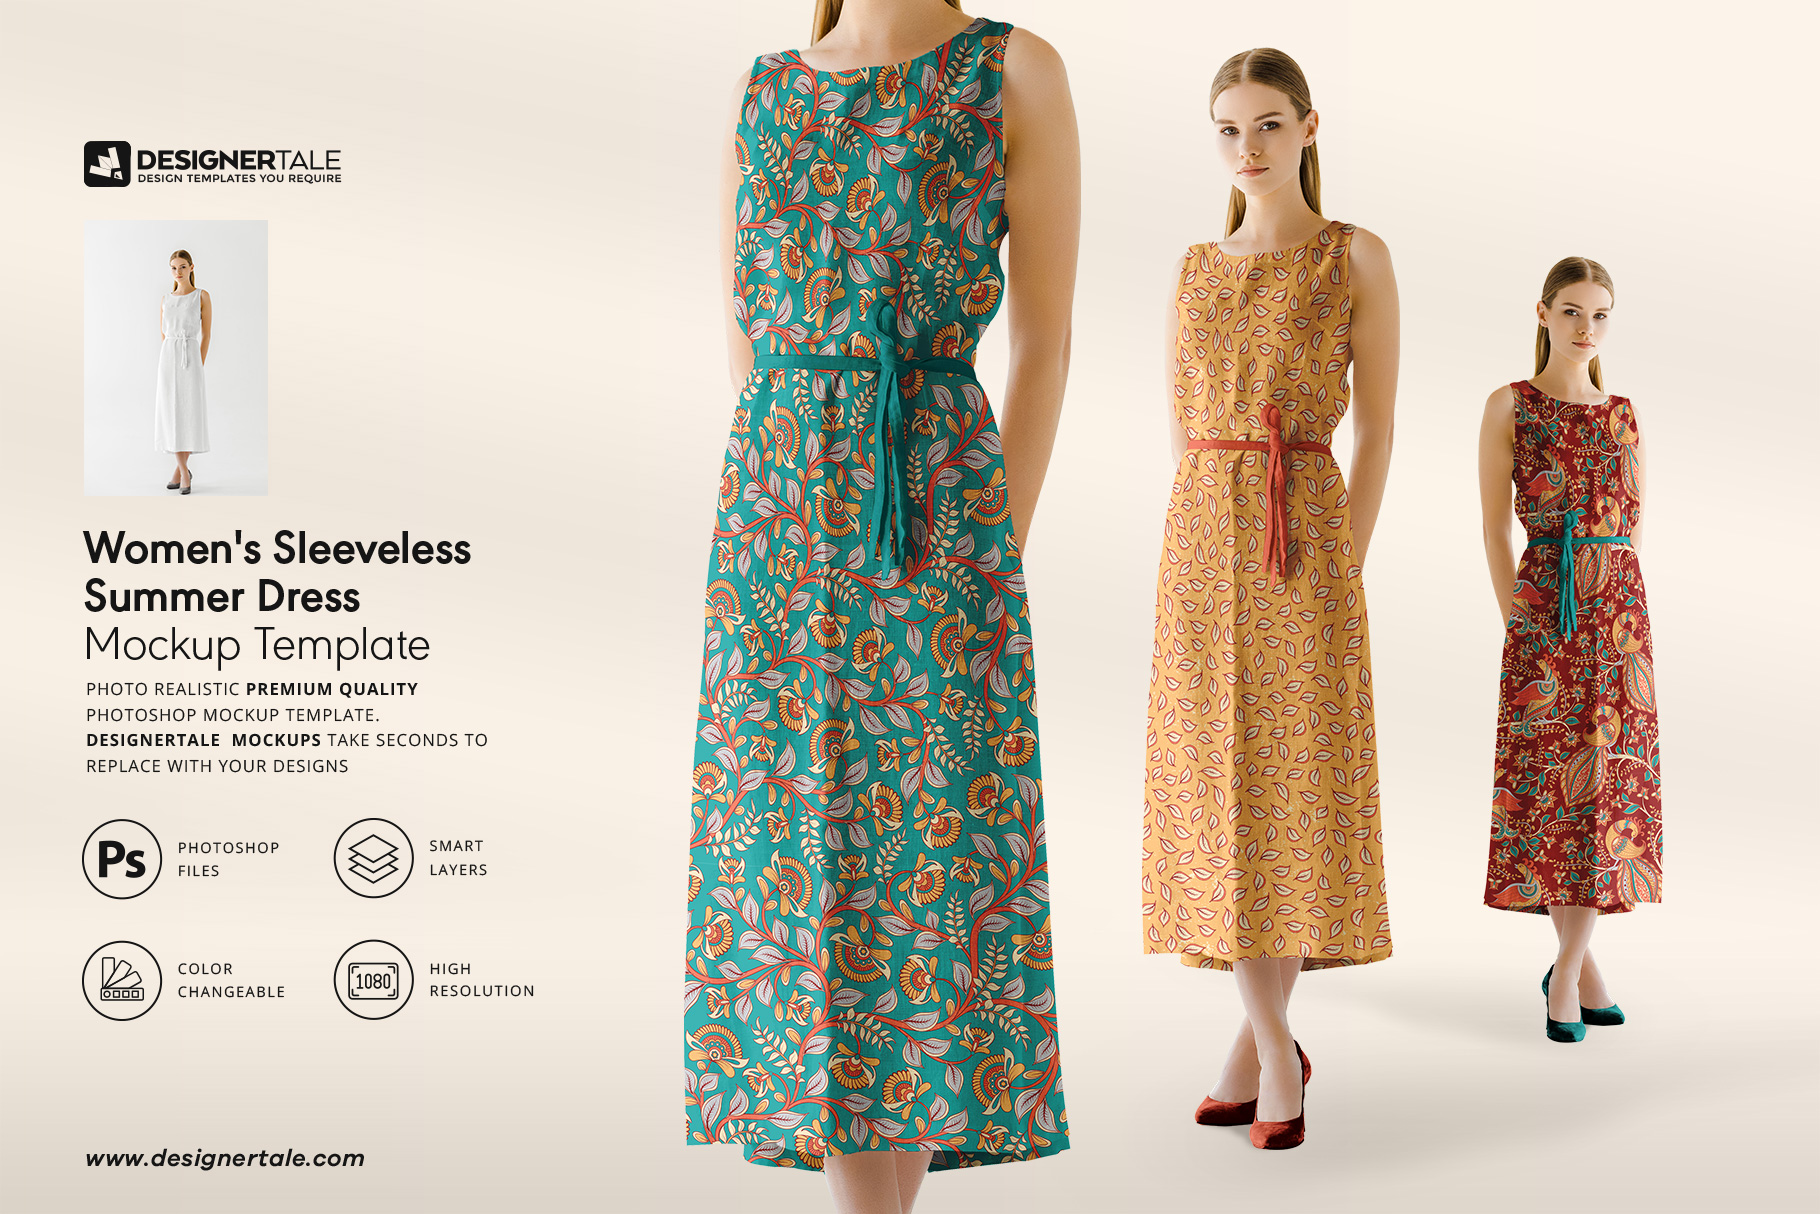 Woman sleeveless summer dress mockup